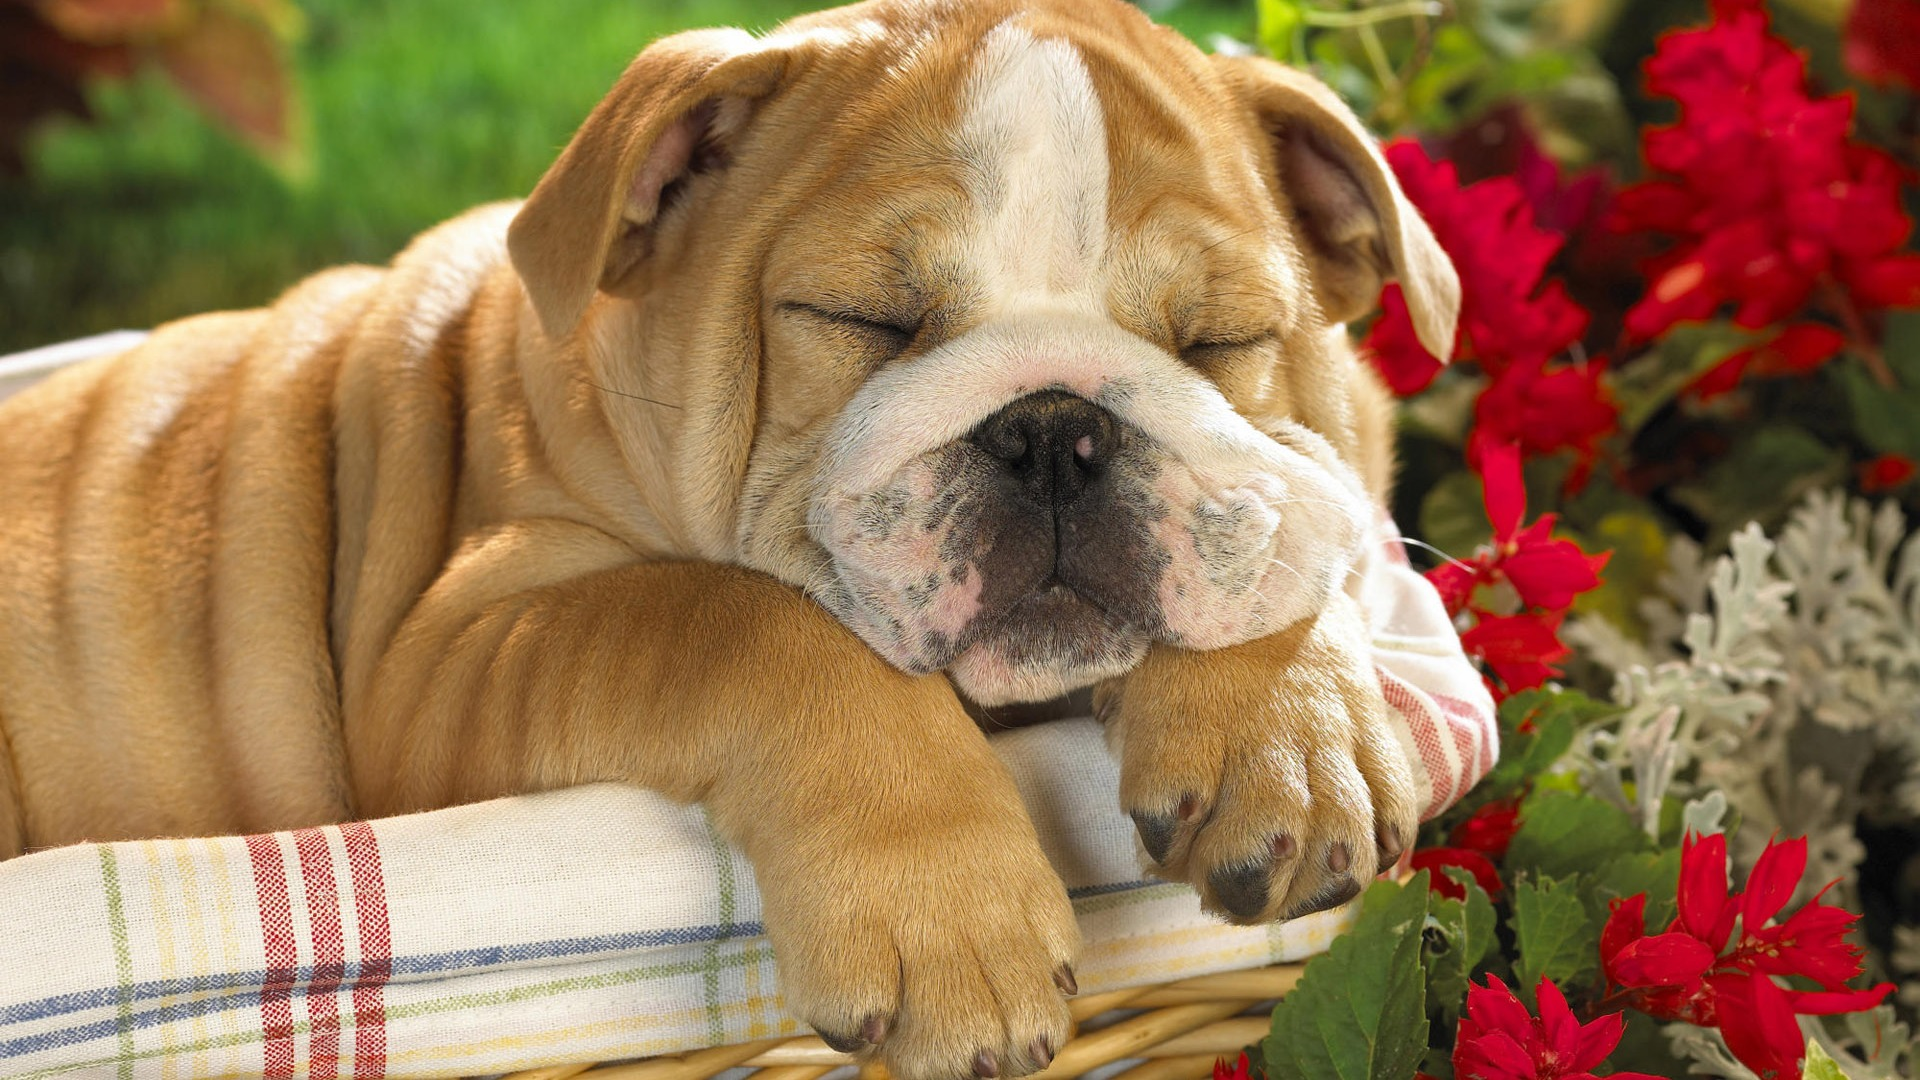 Cute Dogs Wallpaper HD Pictures Freetopwallpapercom 1920x1080